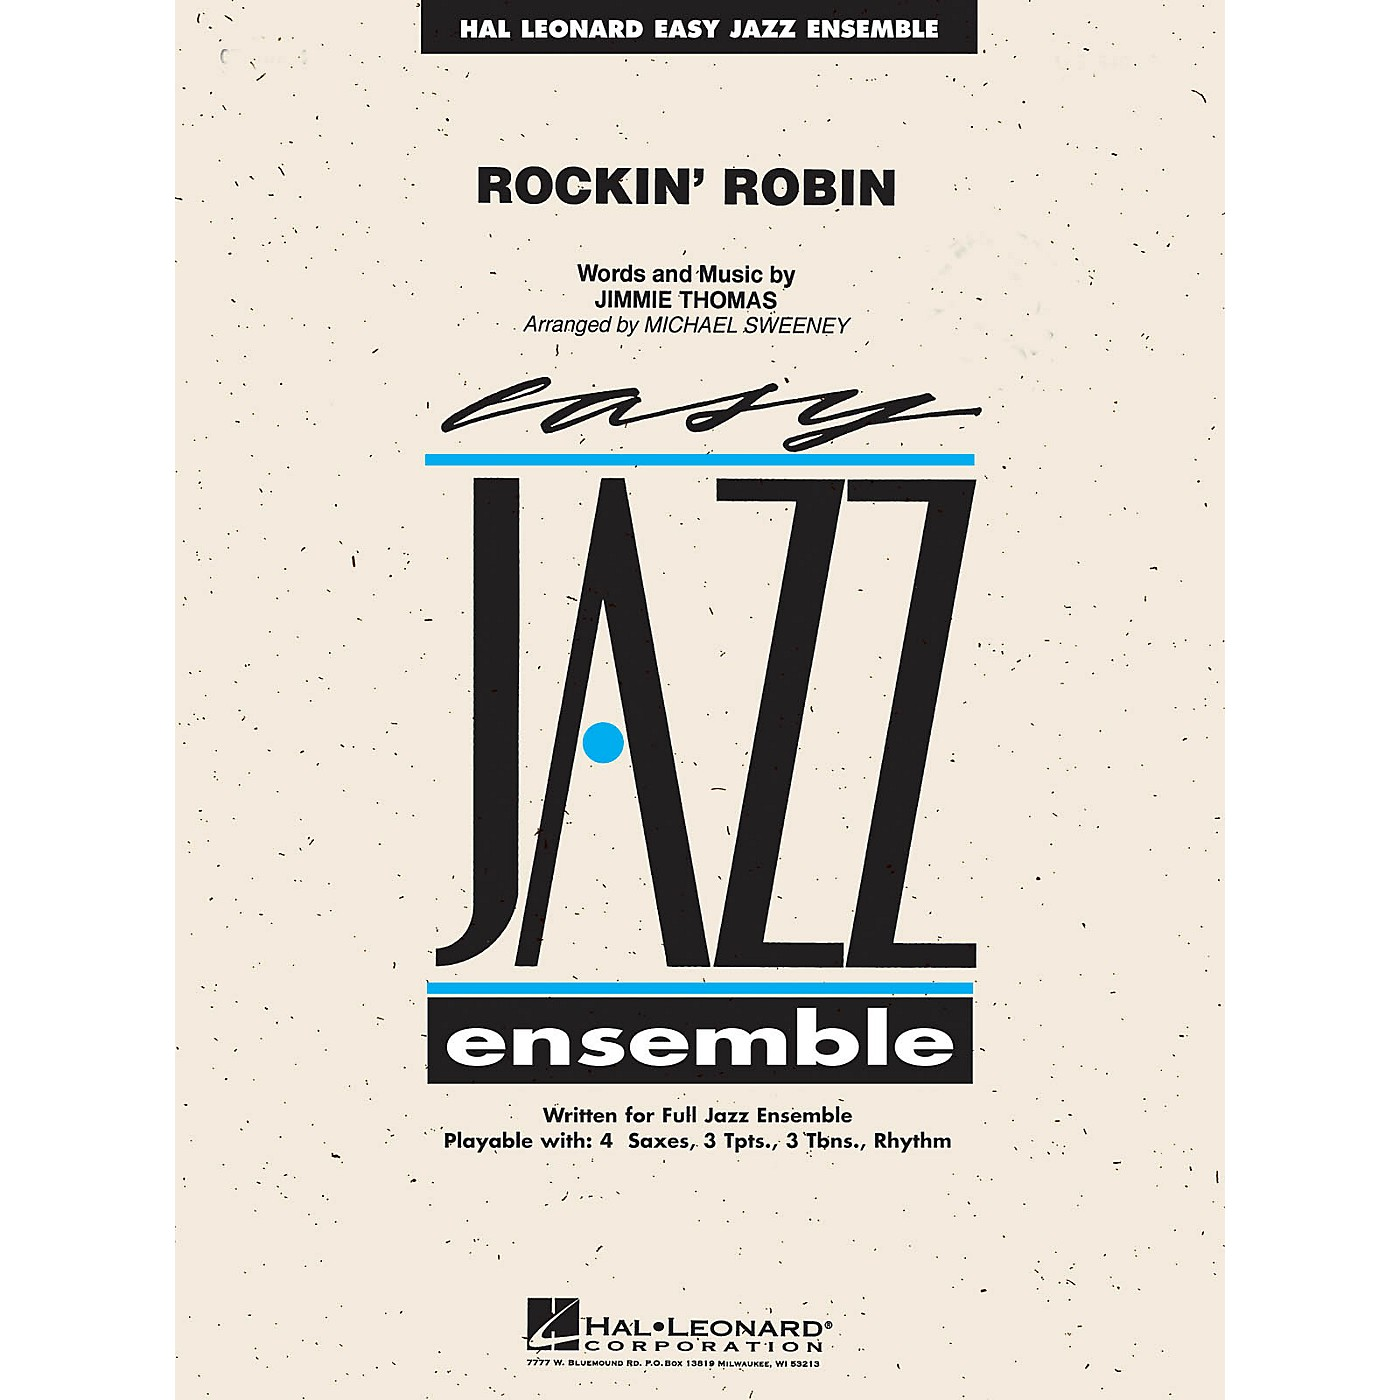 Hal Leonard Rockin' Robin Jazz Band Level 2 Arranged by Michael Sweeney thumbnail